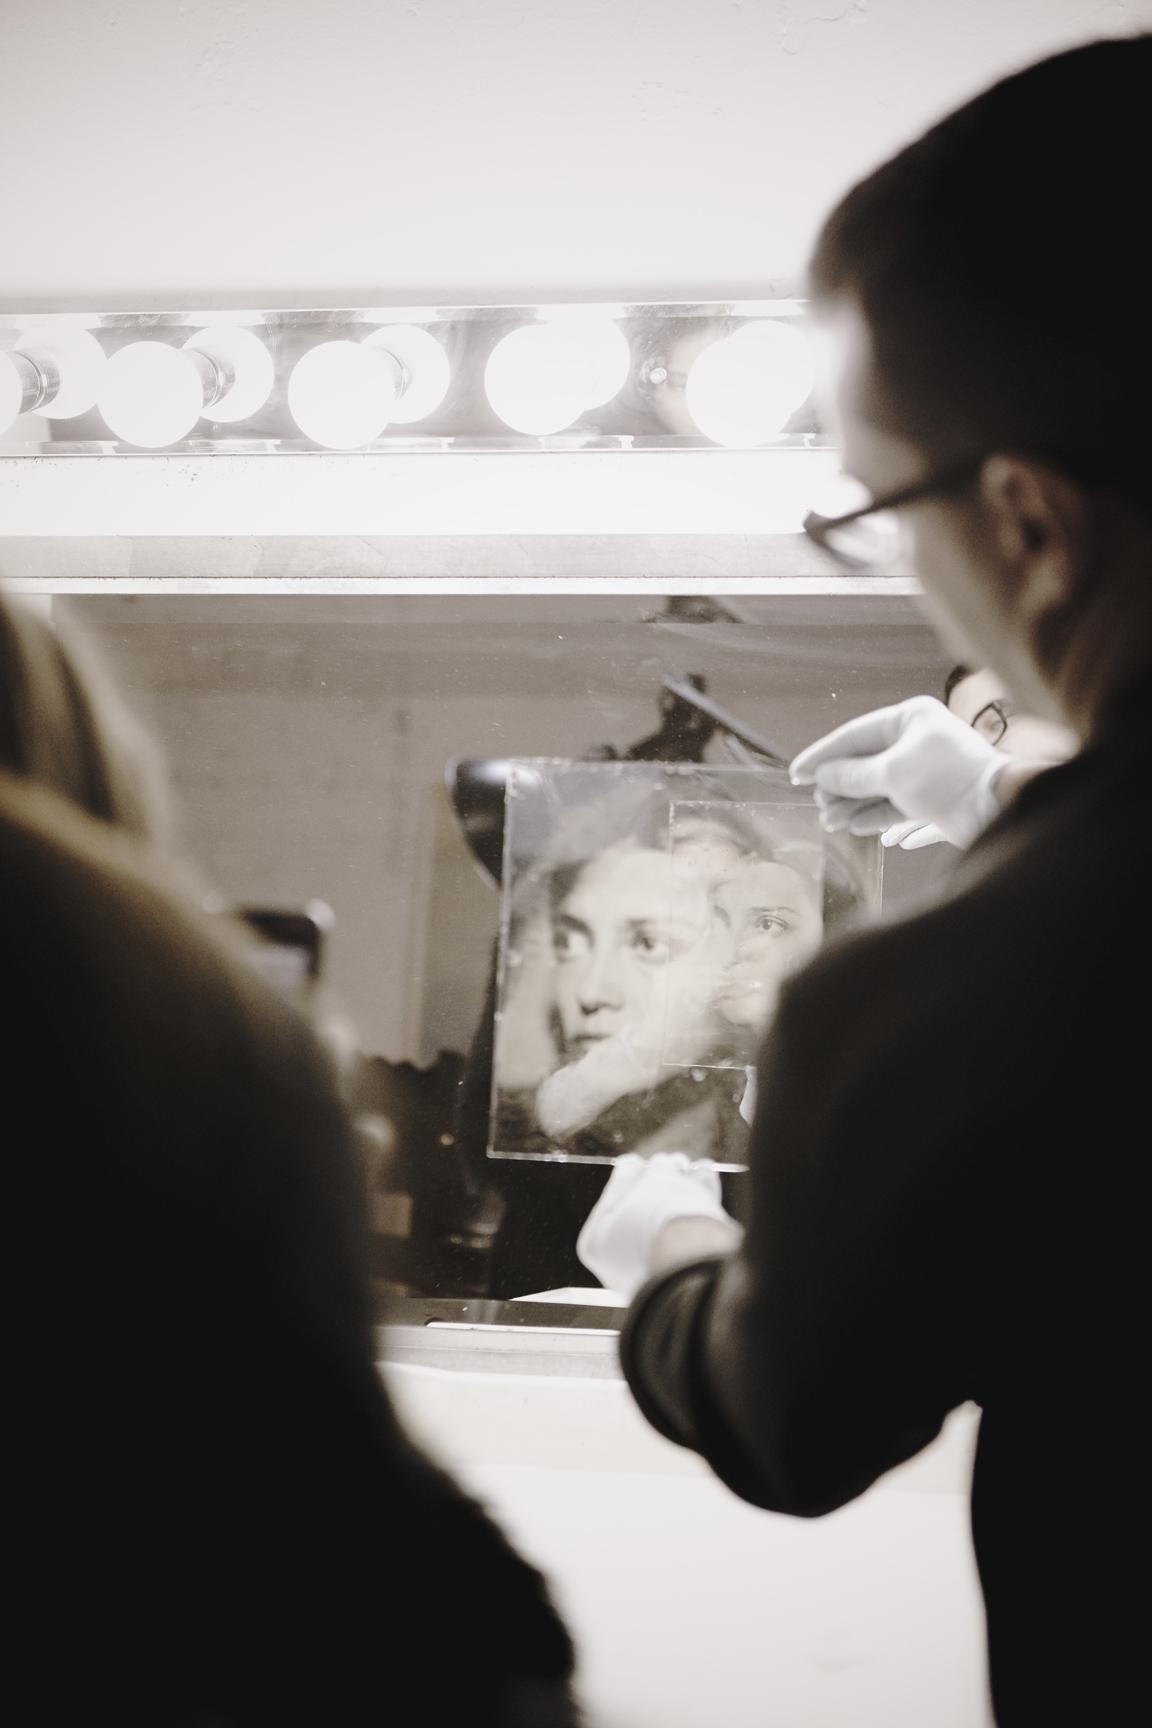 JAMES-WEBER-PHOTOGRAPHER-wetplate-collodion-13493.jpg